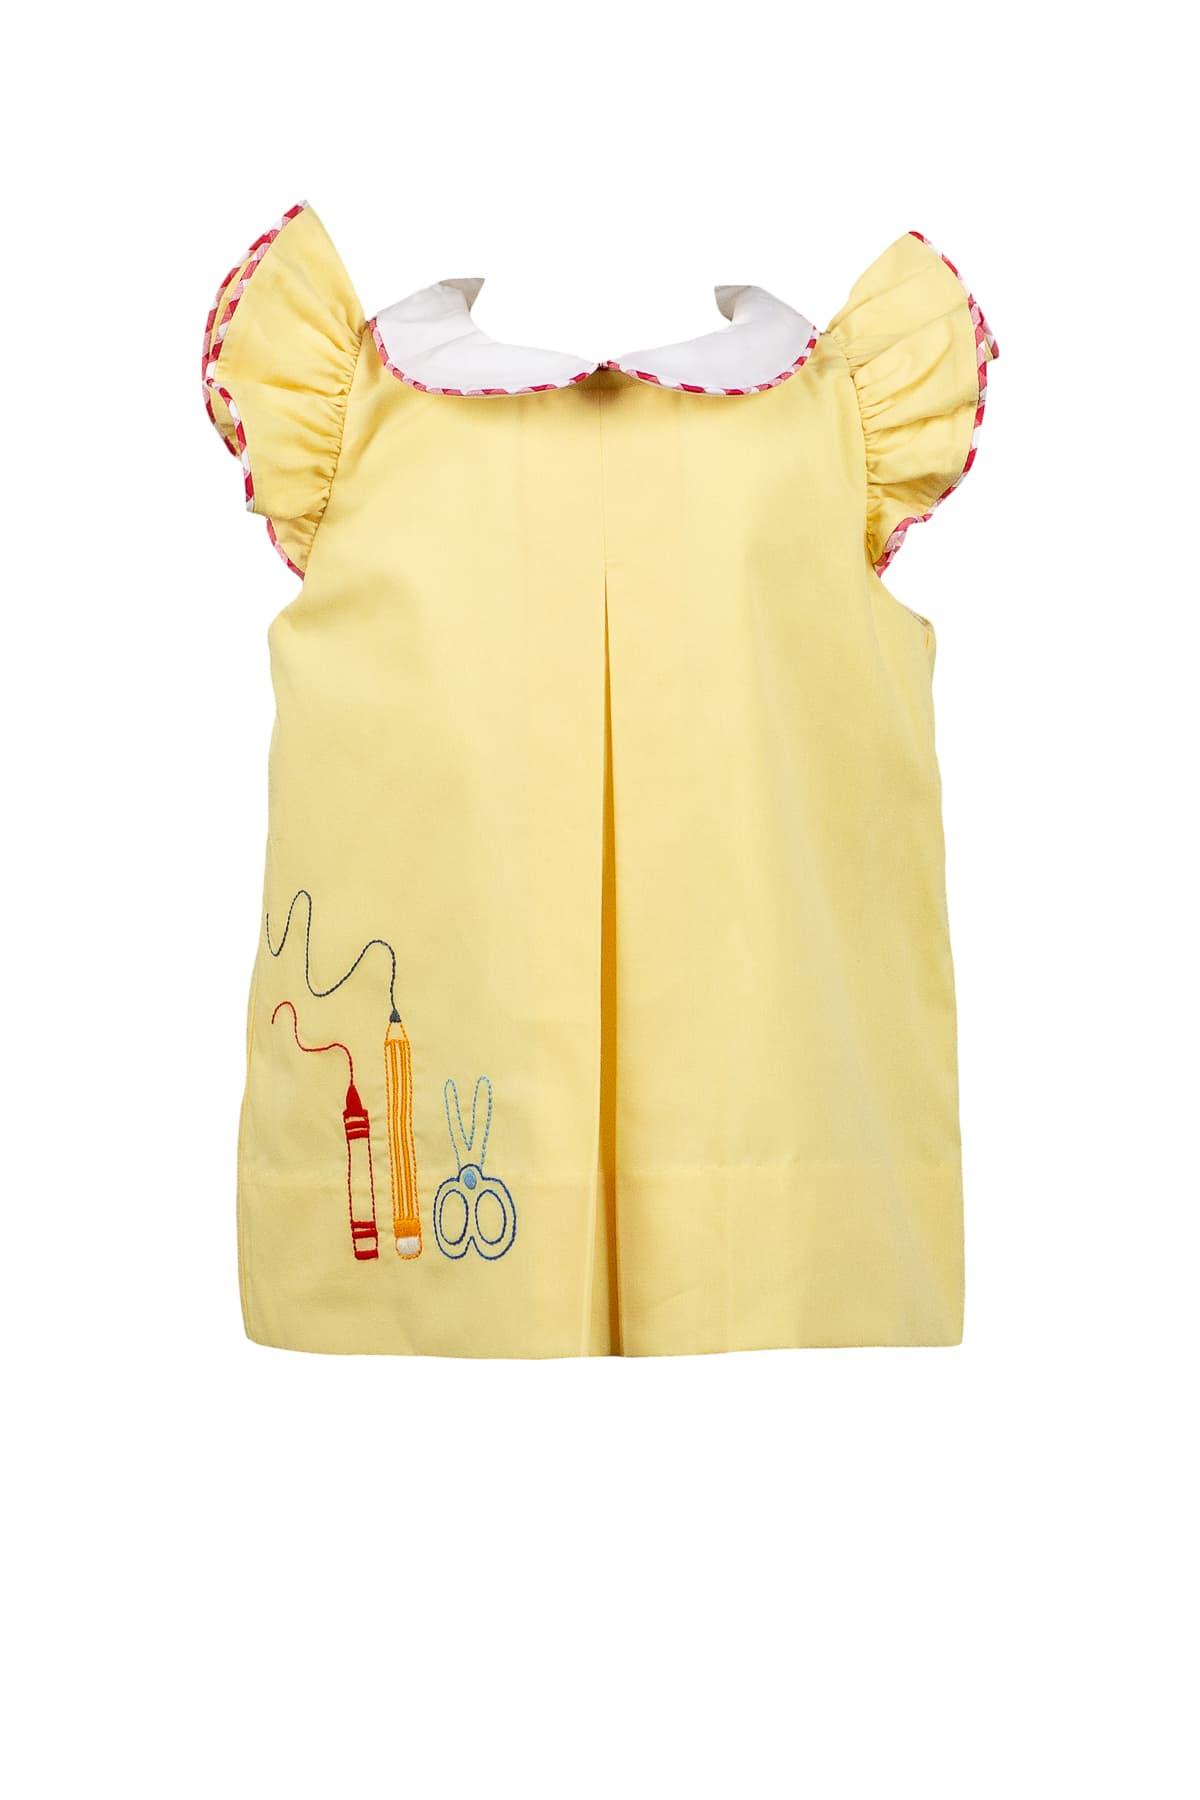 POLLY PENCIL DRESS